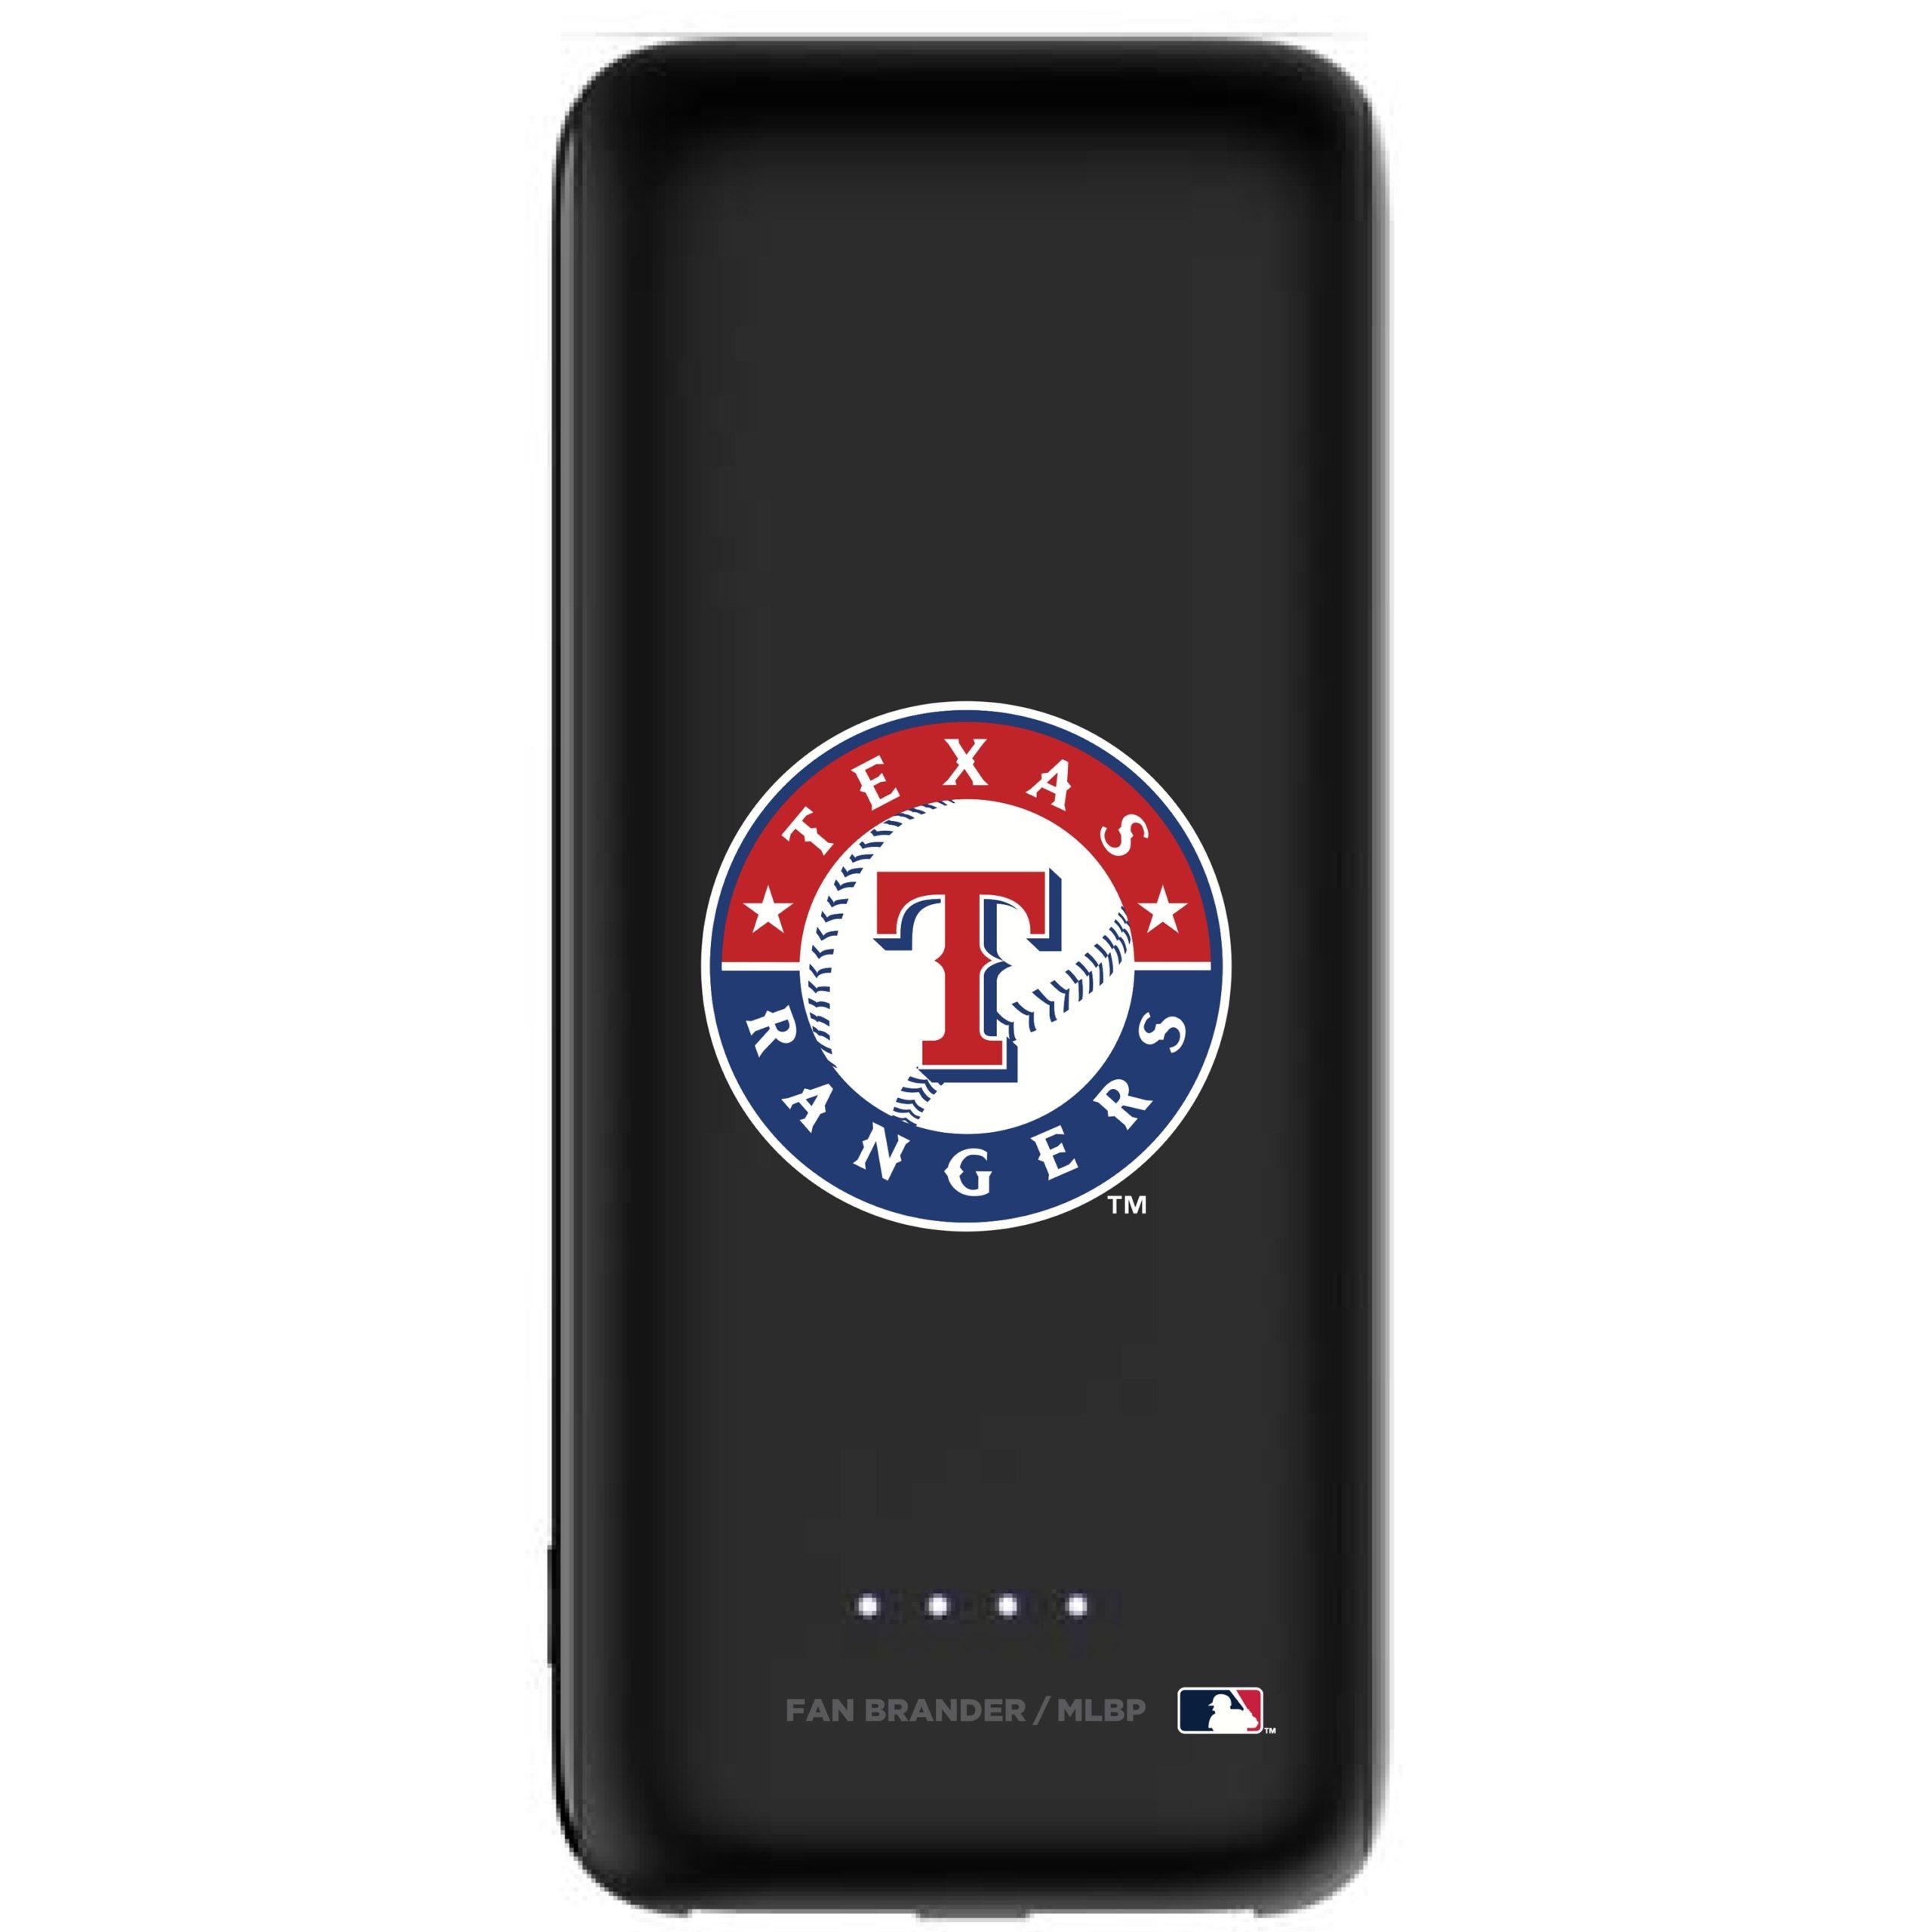 Texas Rangers mophie 5200 mAh Universal Battery Power Boost